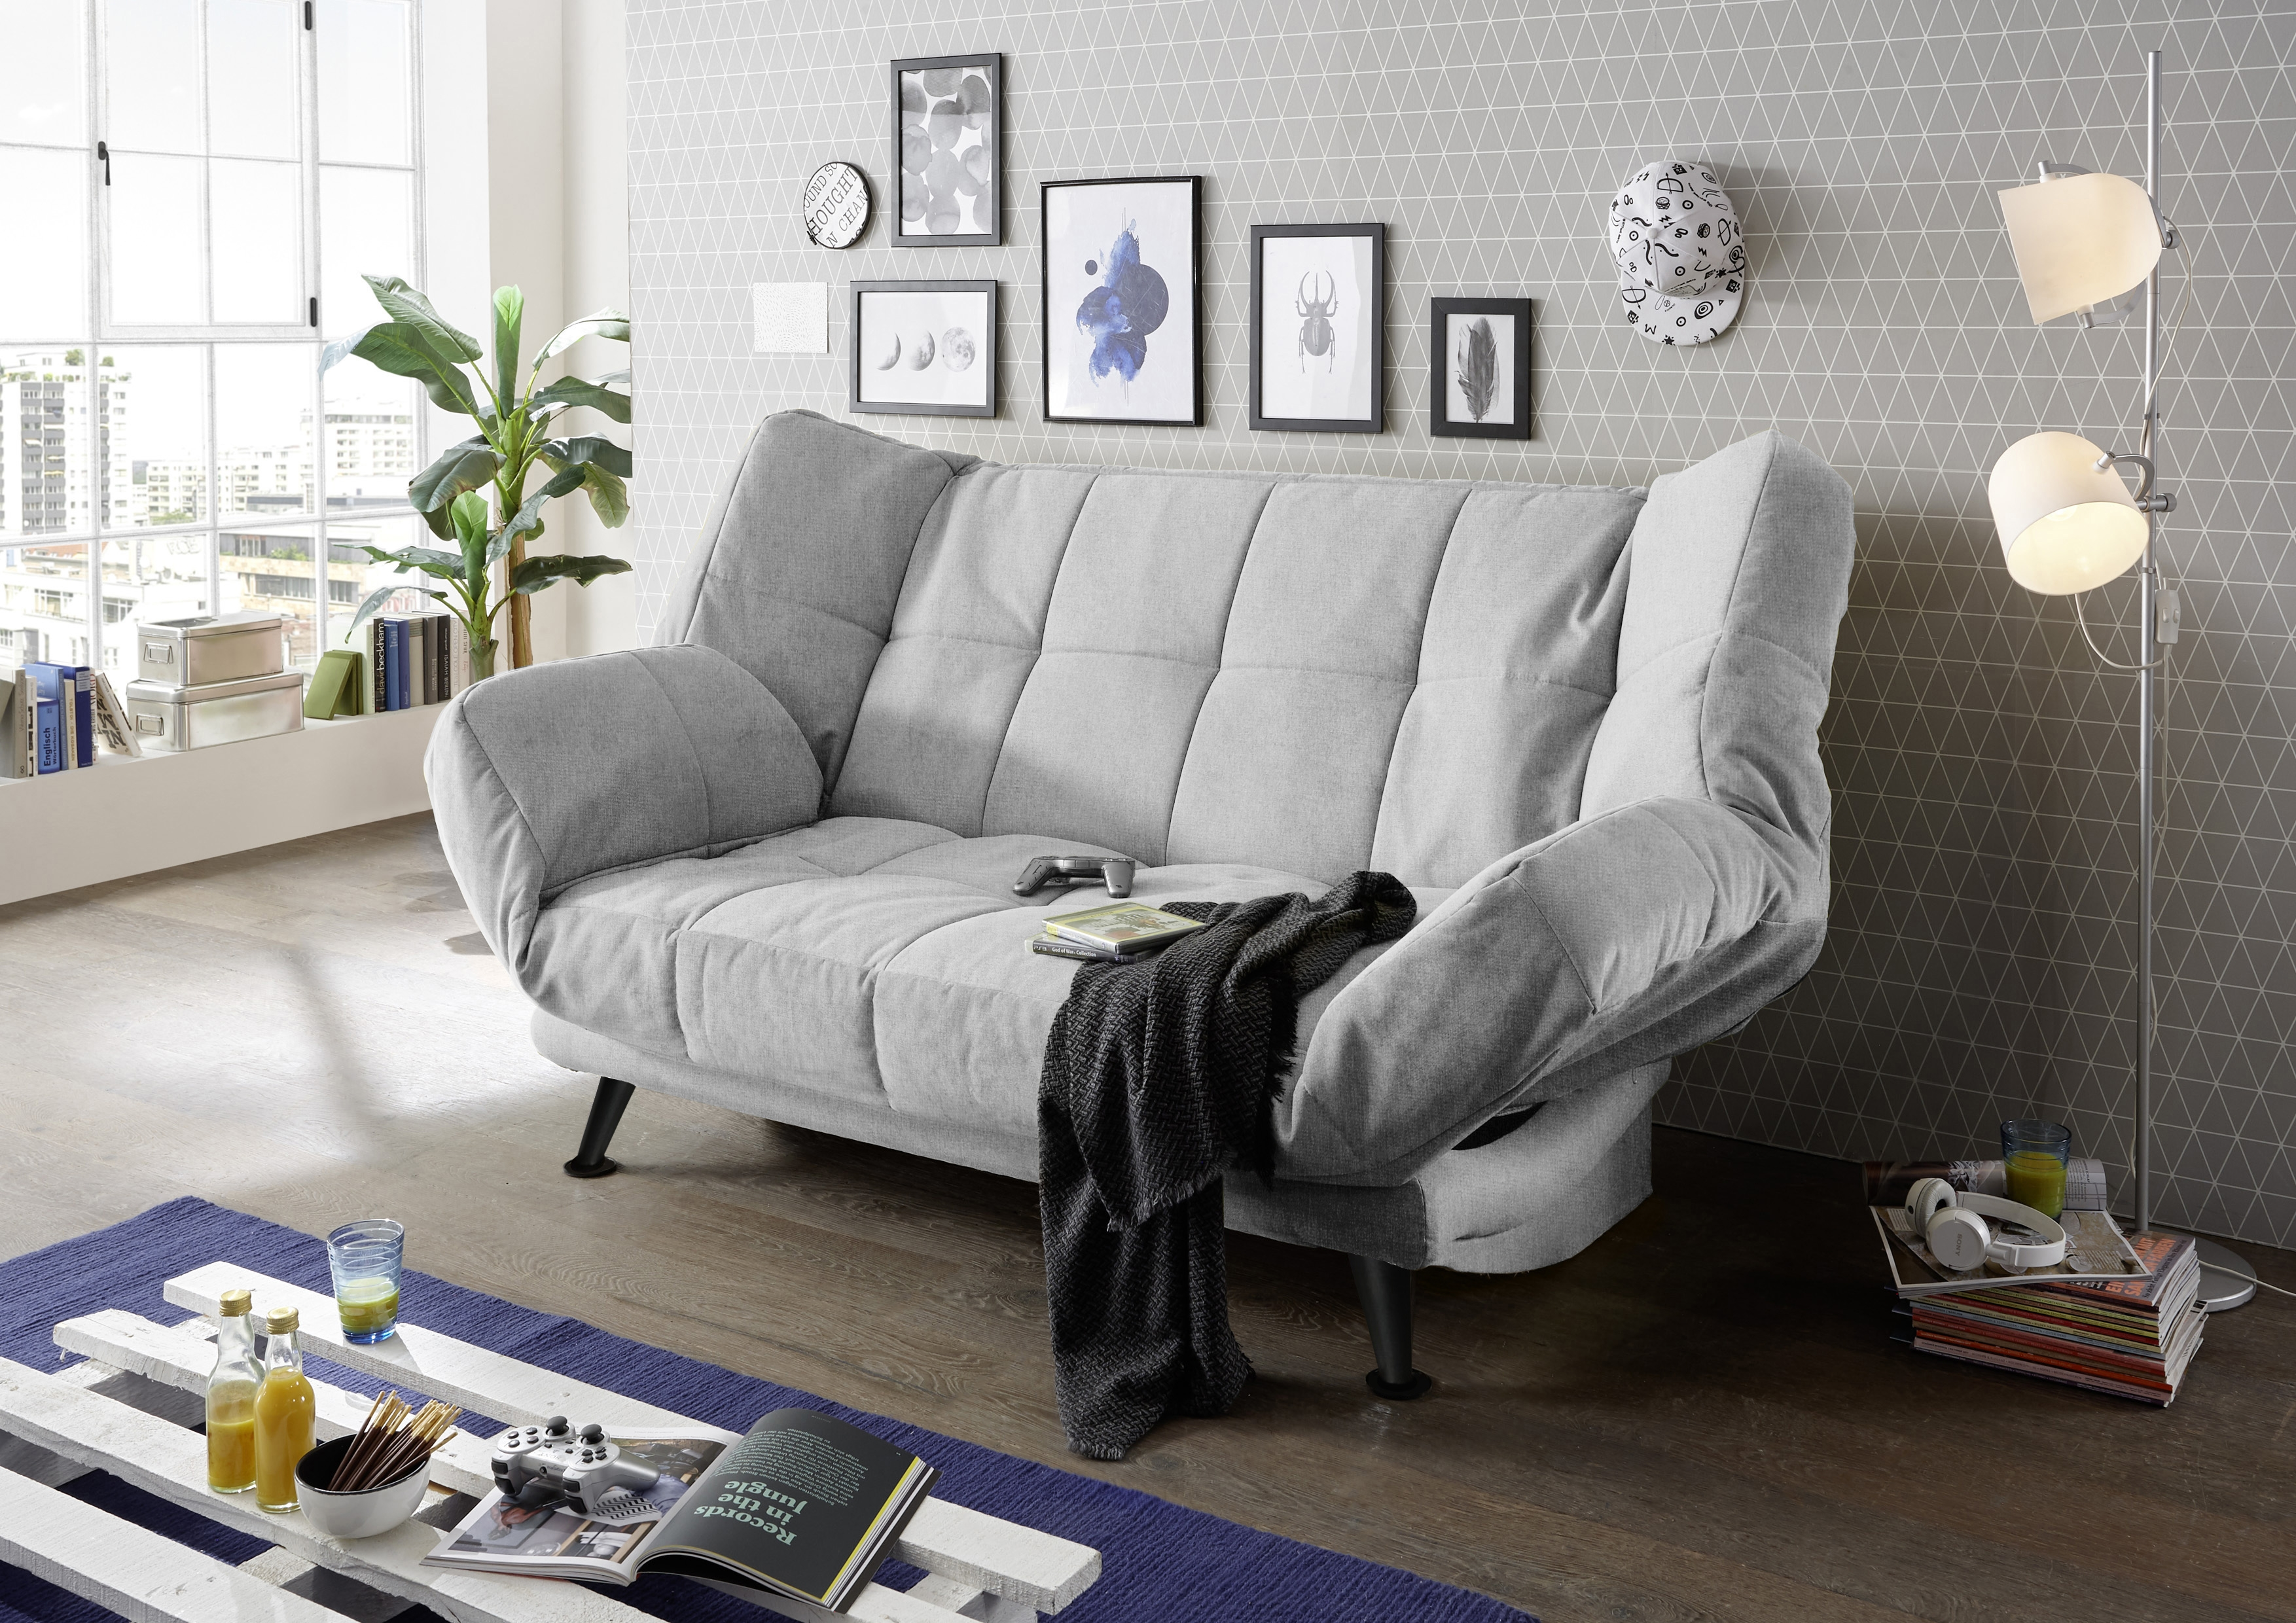 Canapea extensibila cu lada de depozitare, tapitata cu stofa, 3 locuri Ikaris 2 Gri, l208xA98xH102 cm